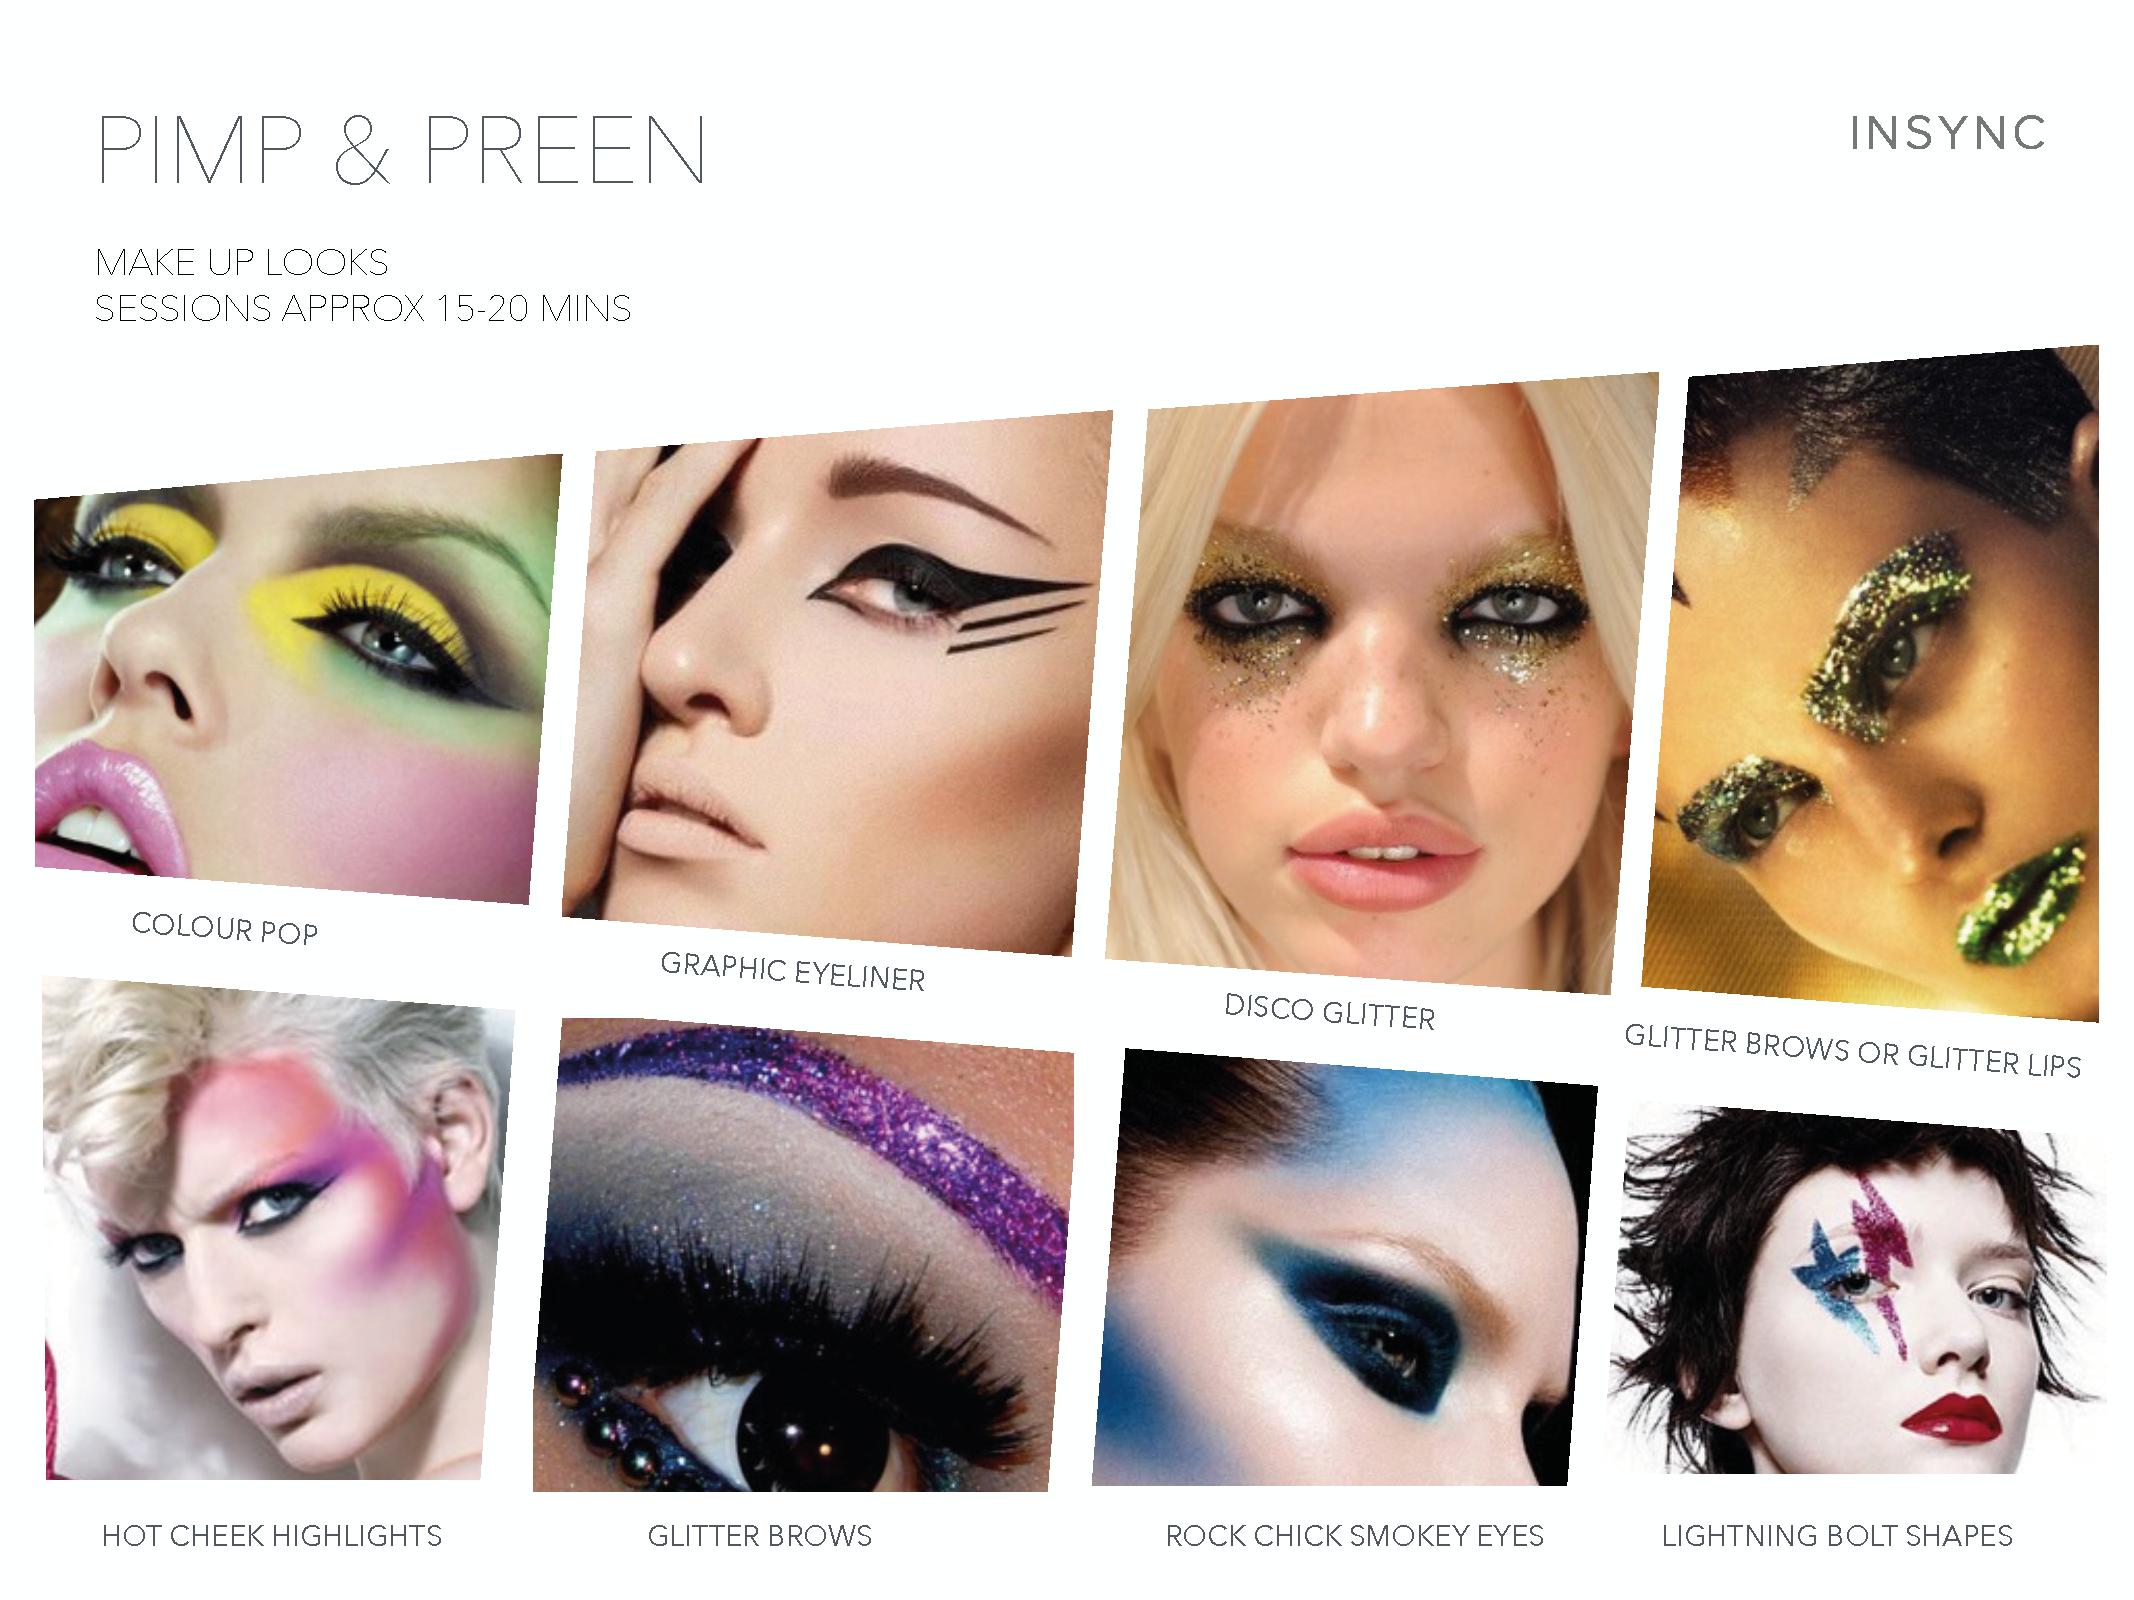 Pimp & Preen_Page_04.png